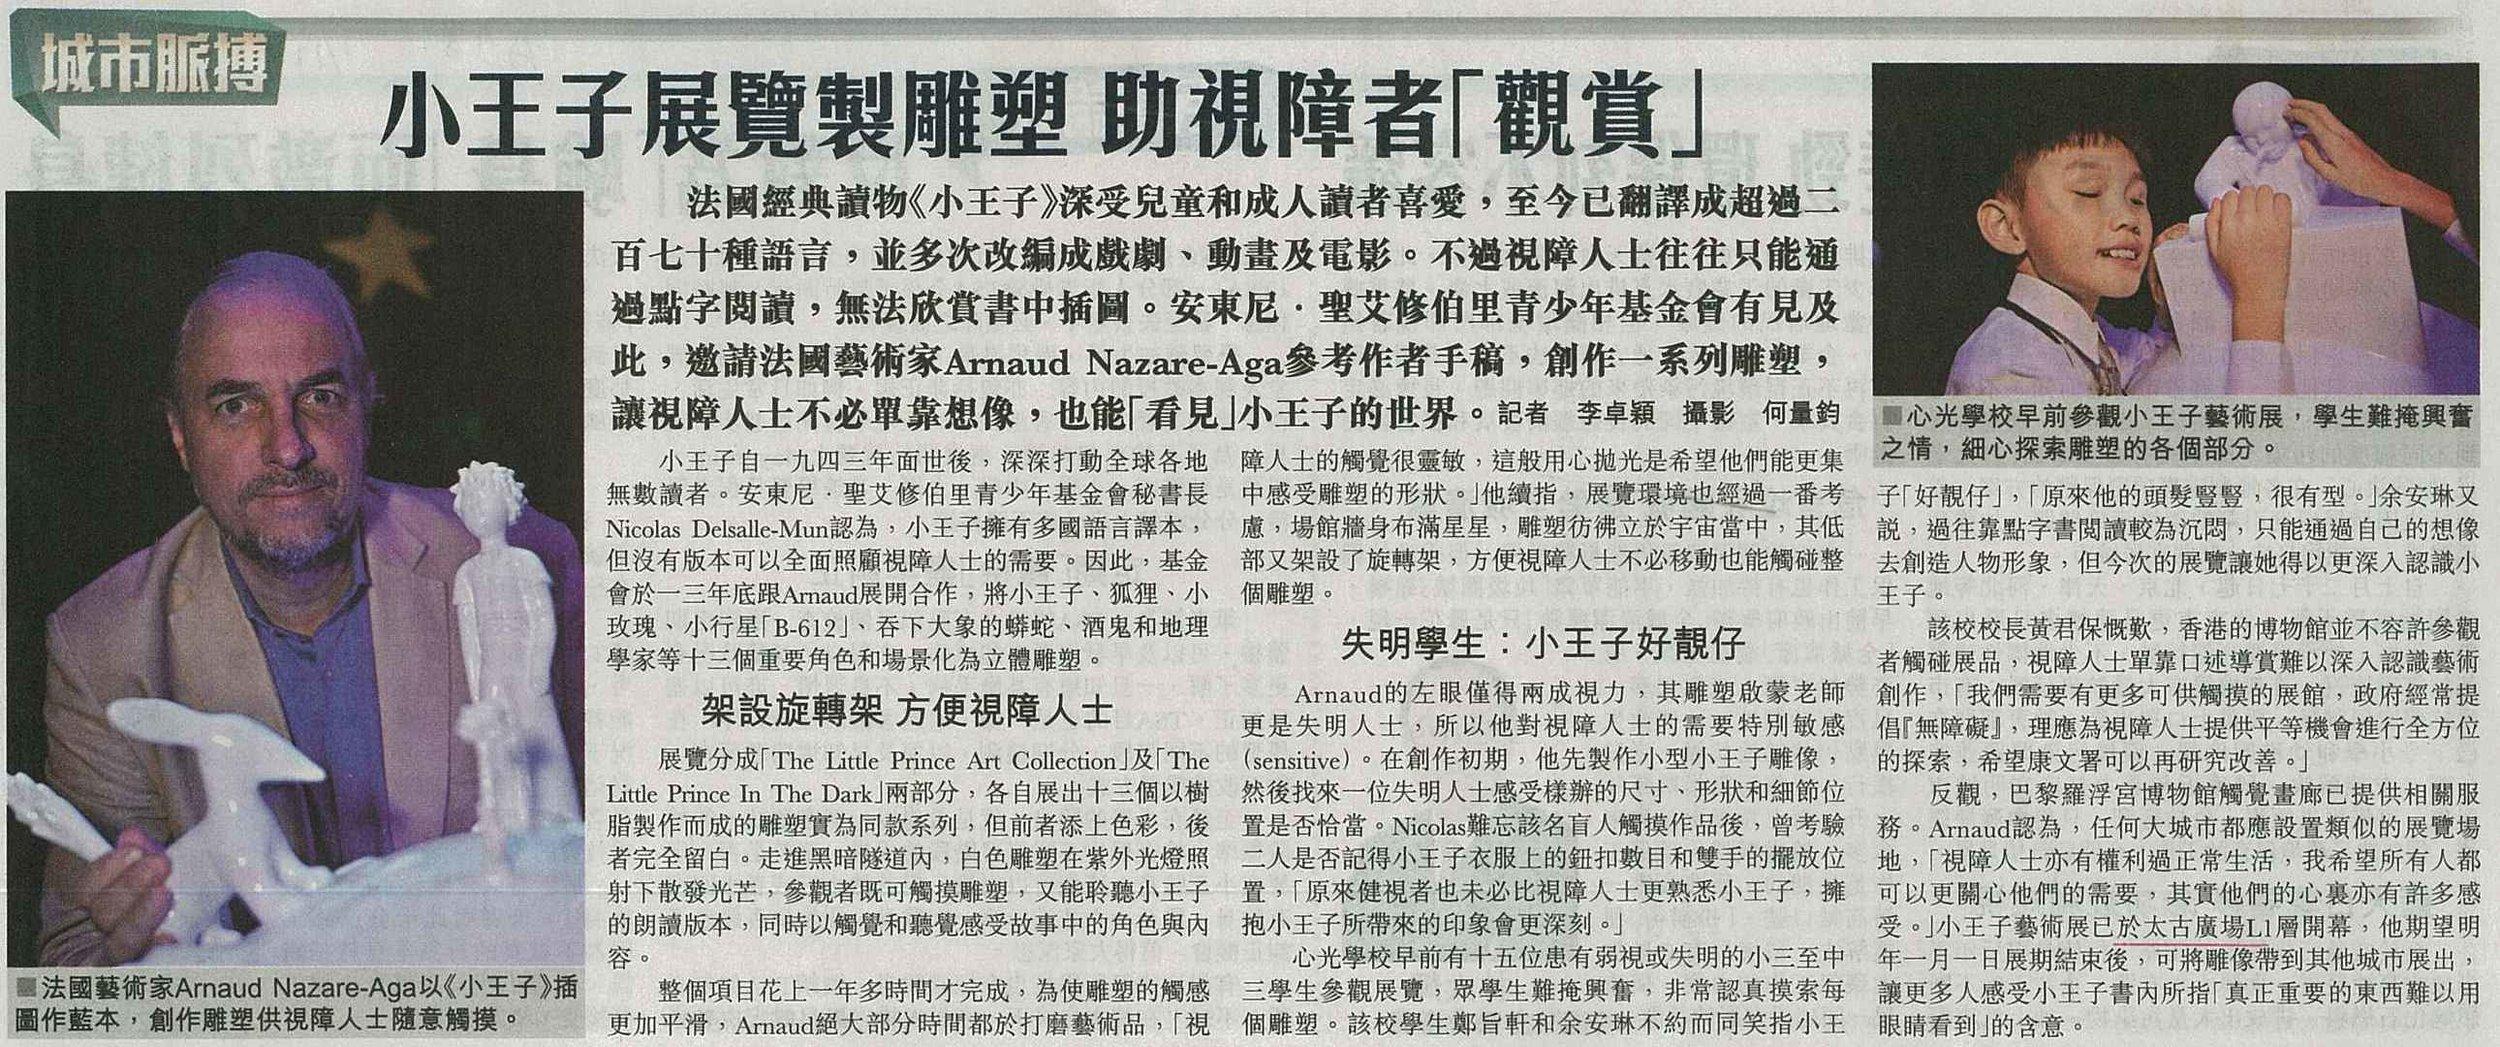 2015.12.09_Sing Tao Daily_P.A18.jpg